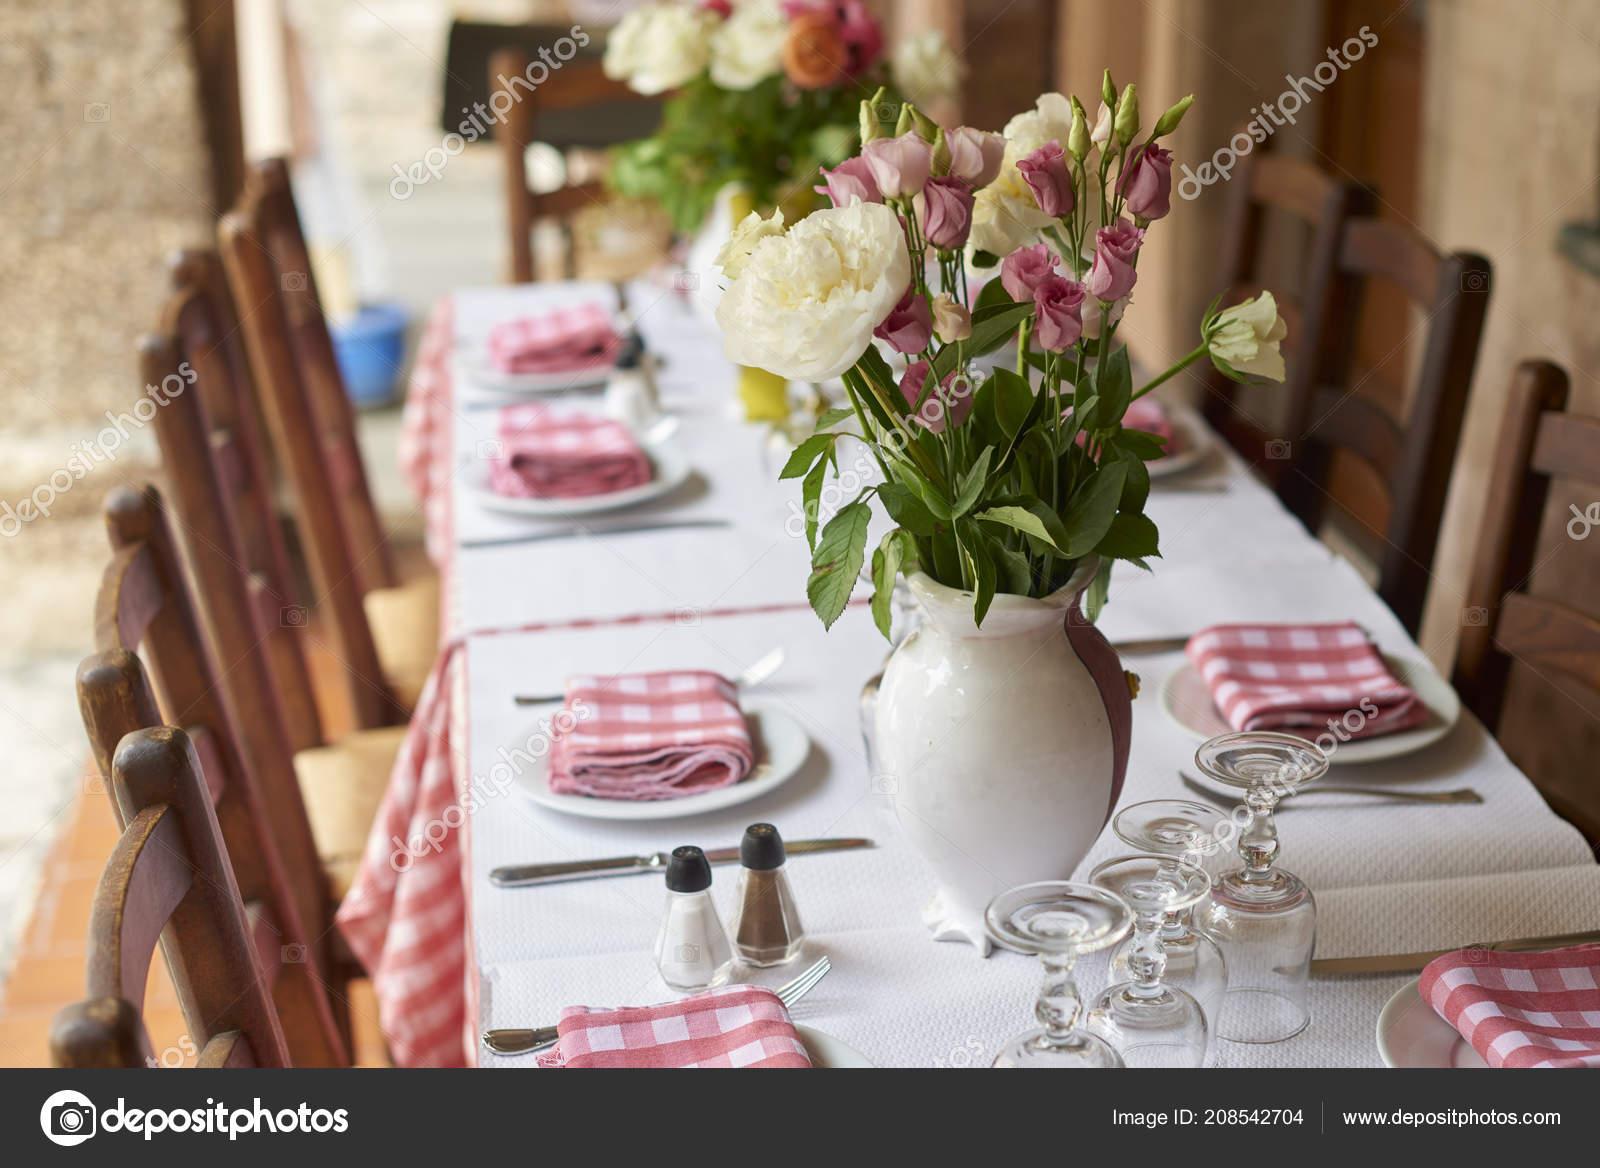 Shot Table Set Meal Restaurant Outdoor Terrace Stock Photo C Gzorgz 208542704